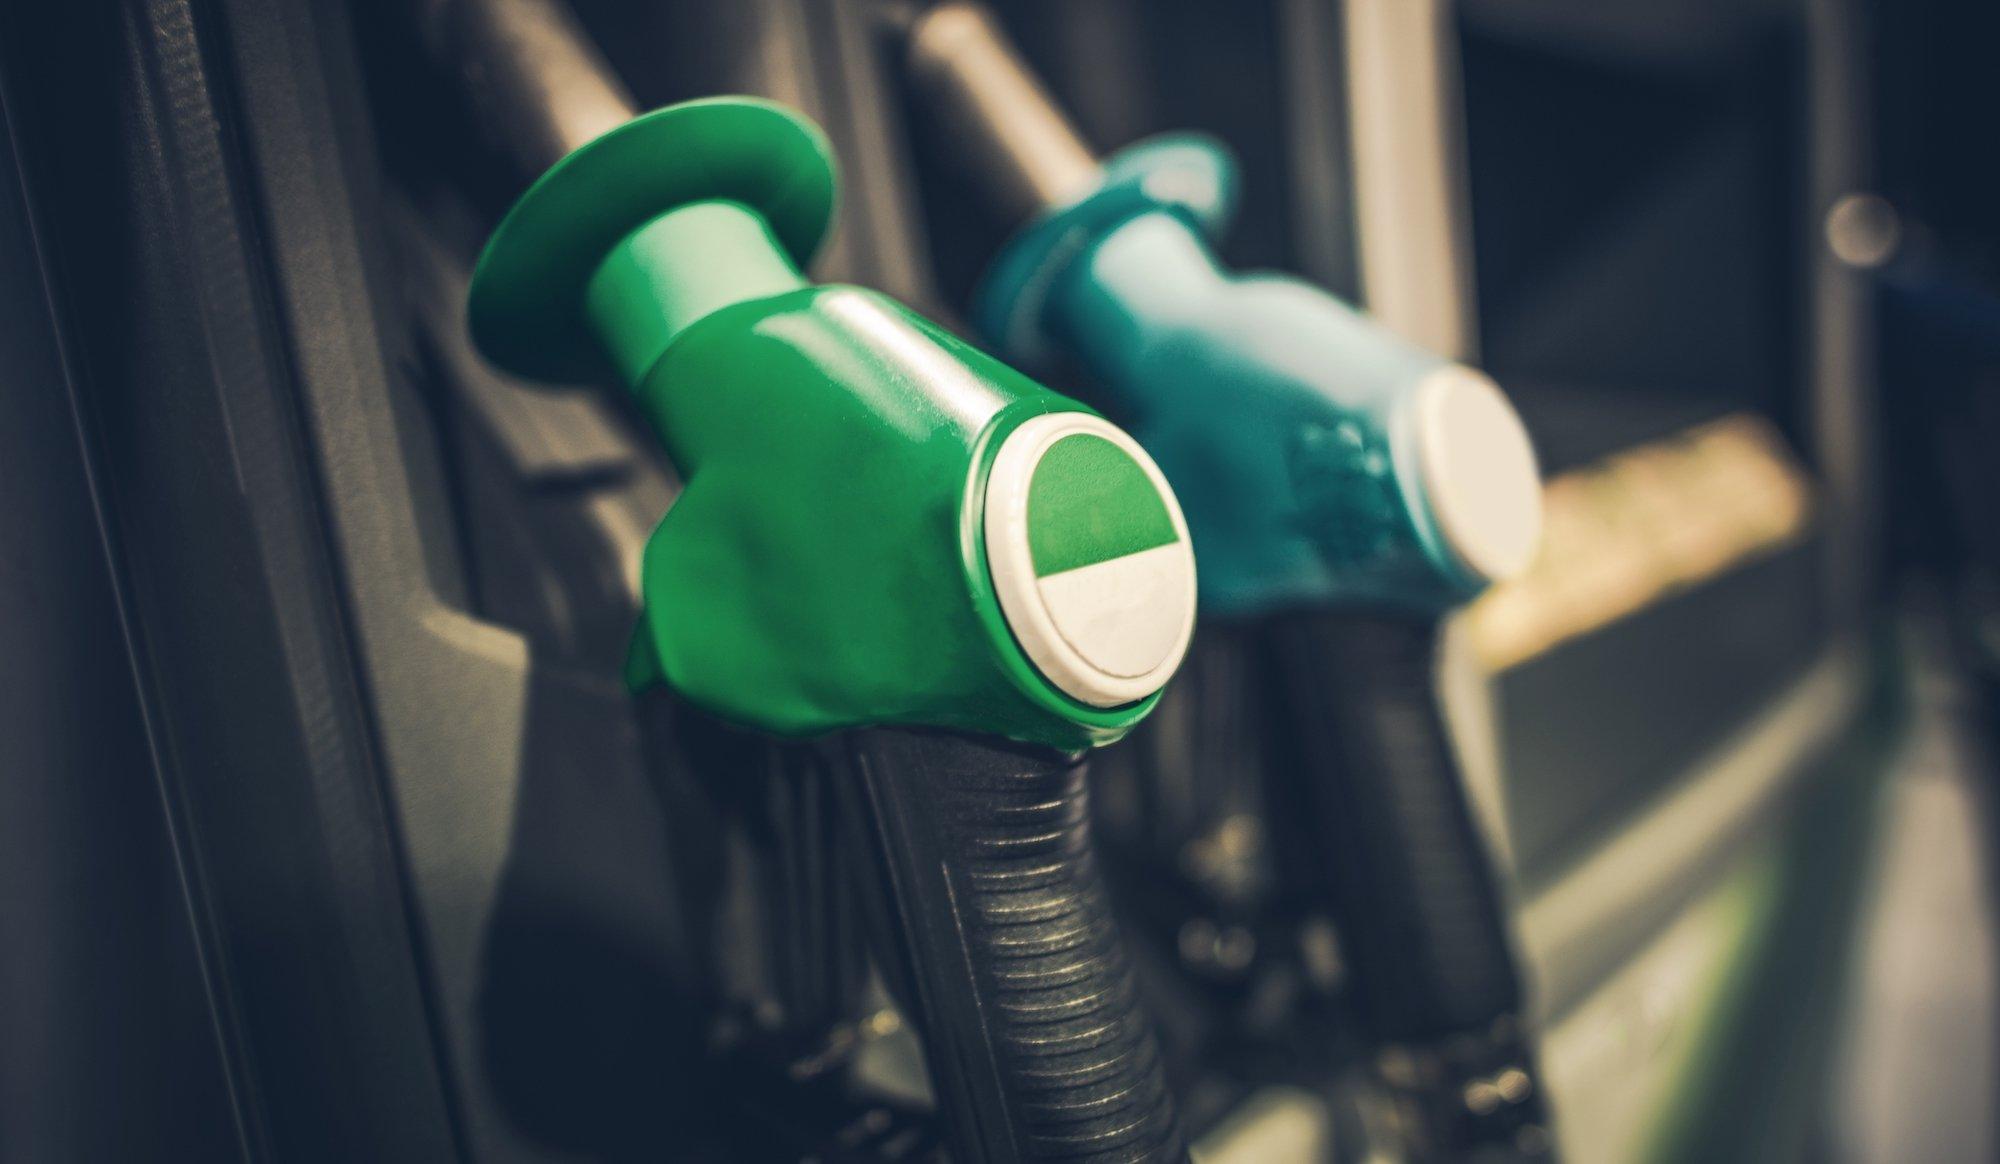 caltex-ctx-asx-ctx-fuel-petrol